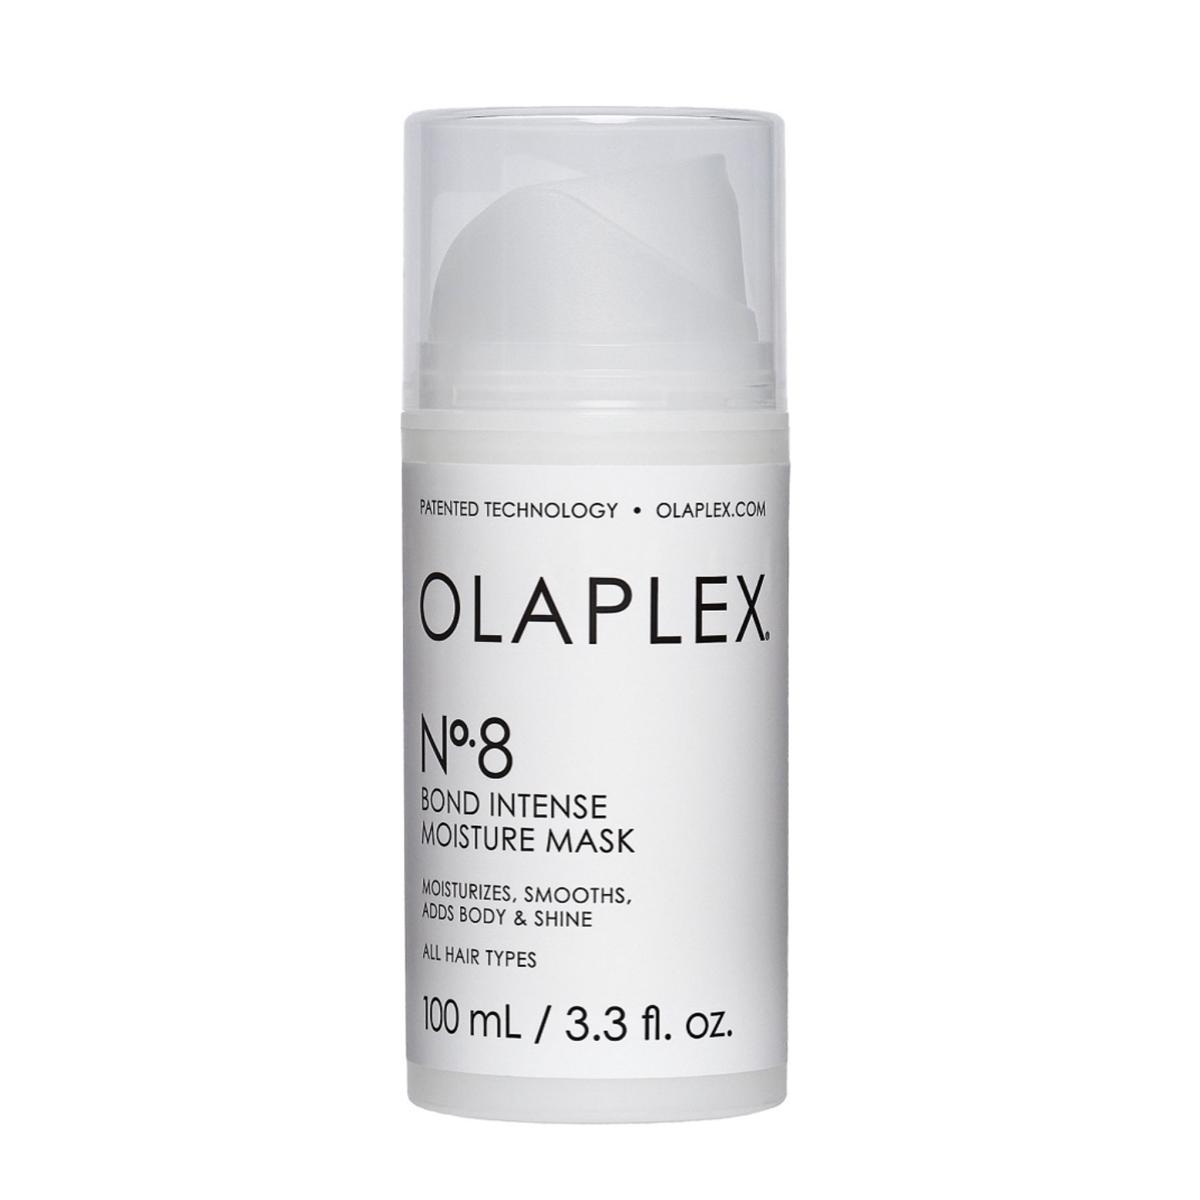 Olaplex n8 Bond Intense Moisture Mask - Ticino